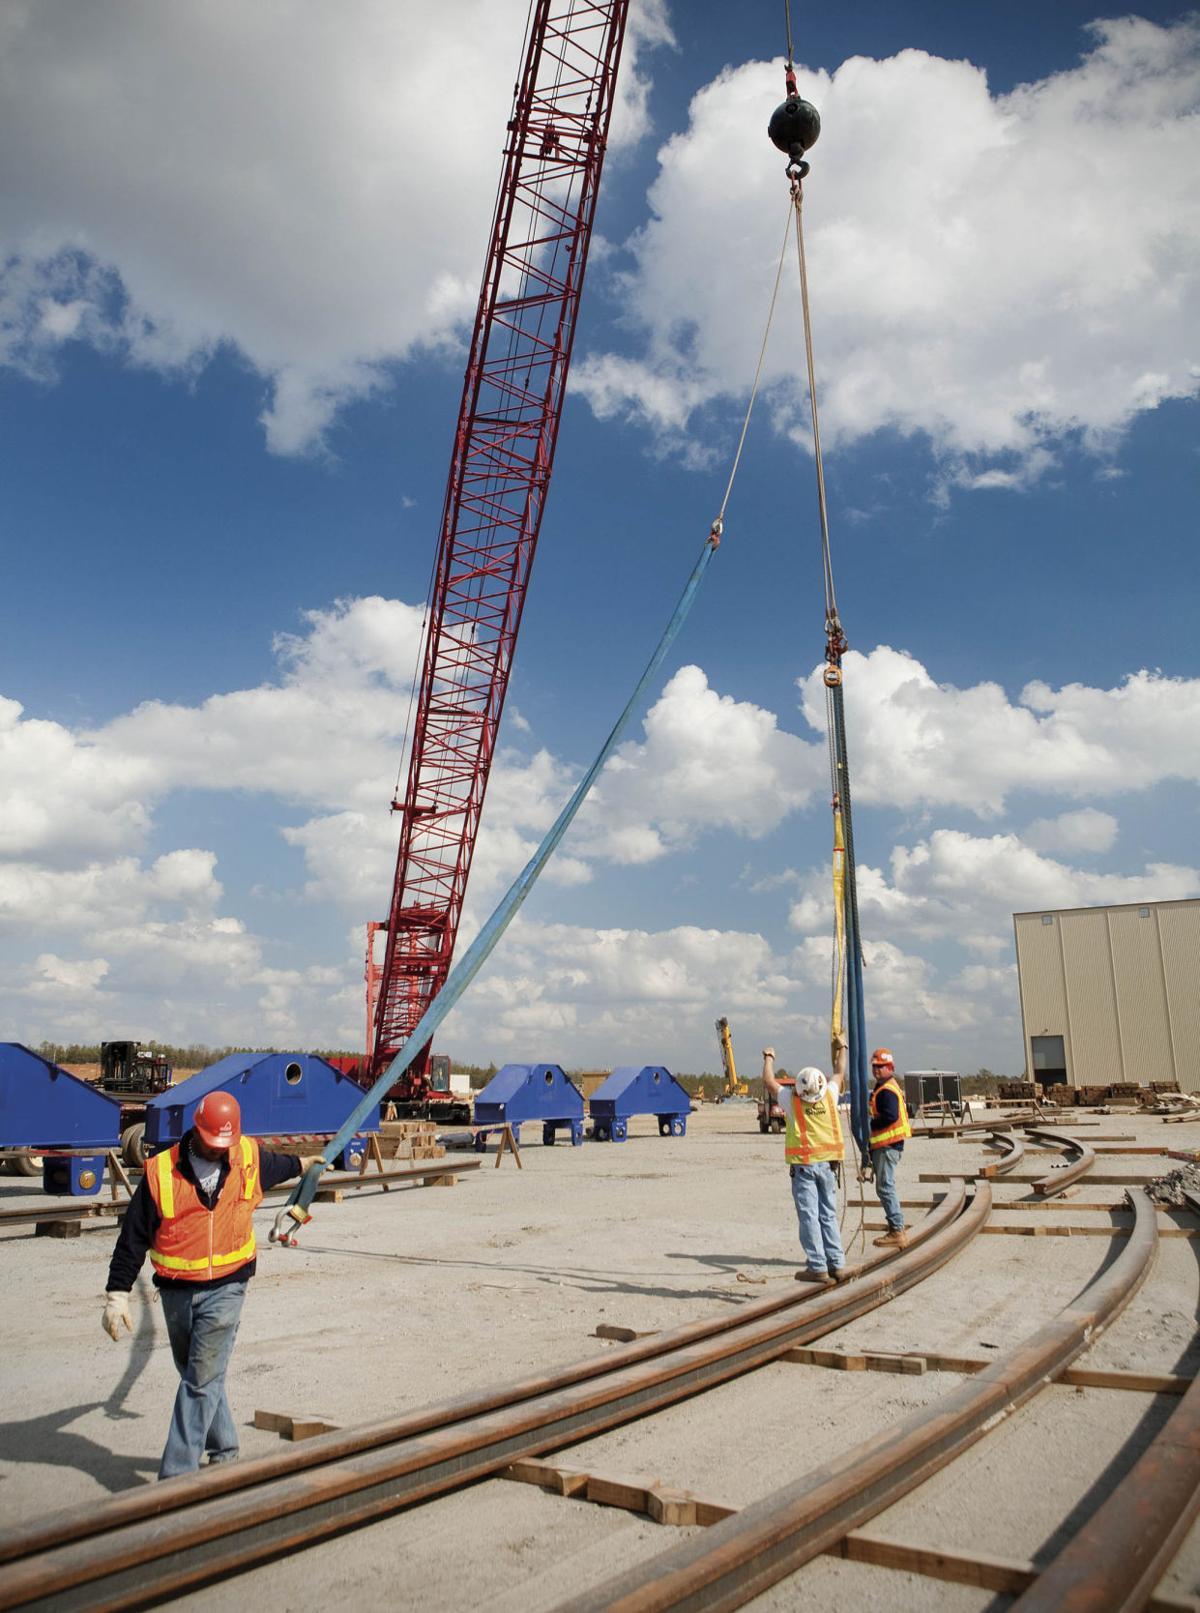 After damage, feds inspect construction at SC nuke plant